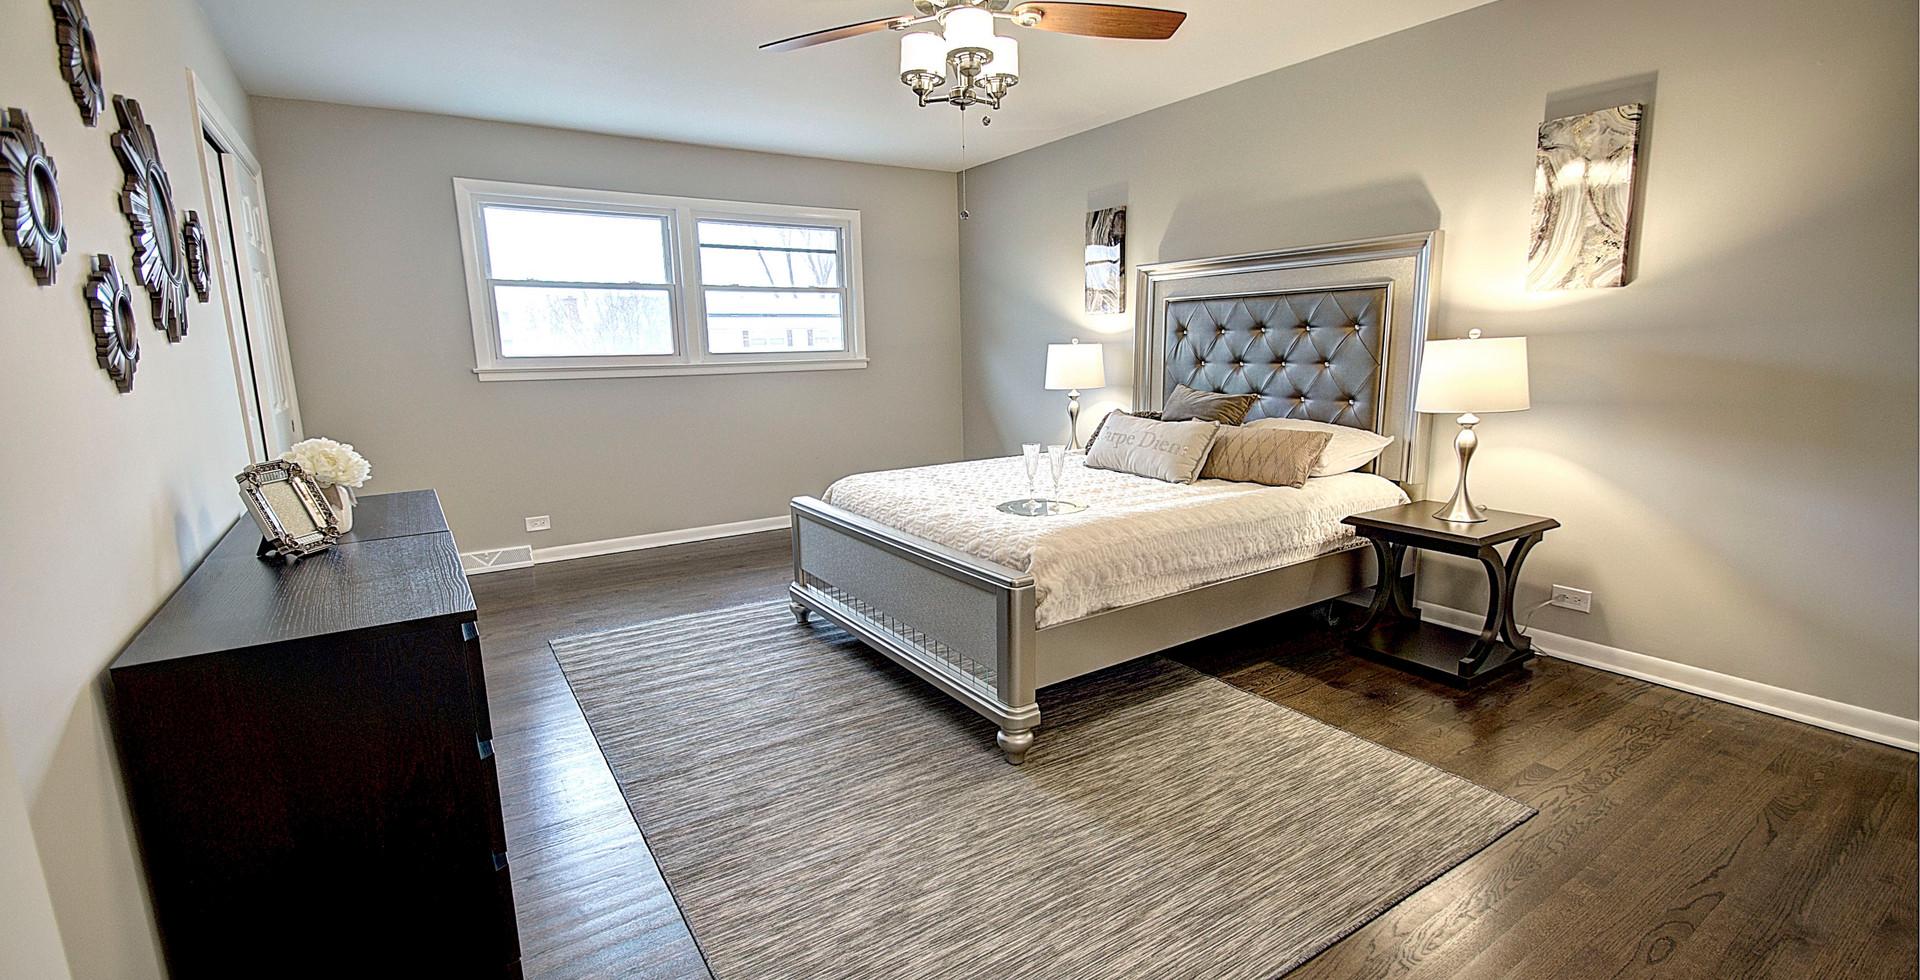 Bedroom in Villa Park designed by MRM Home Design.jpg